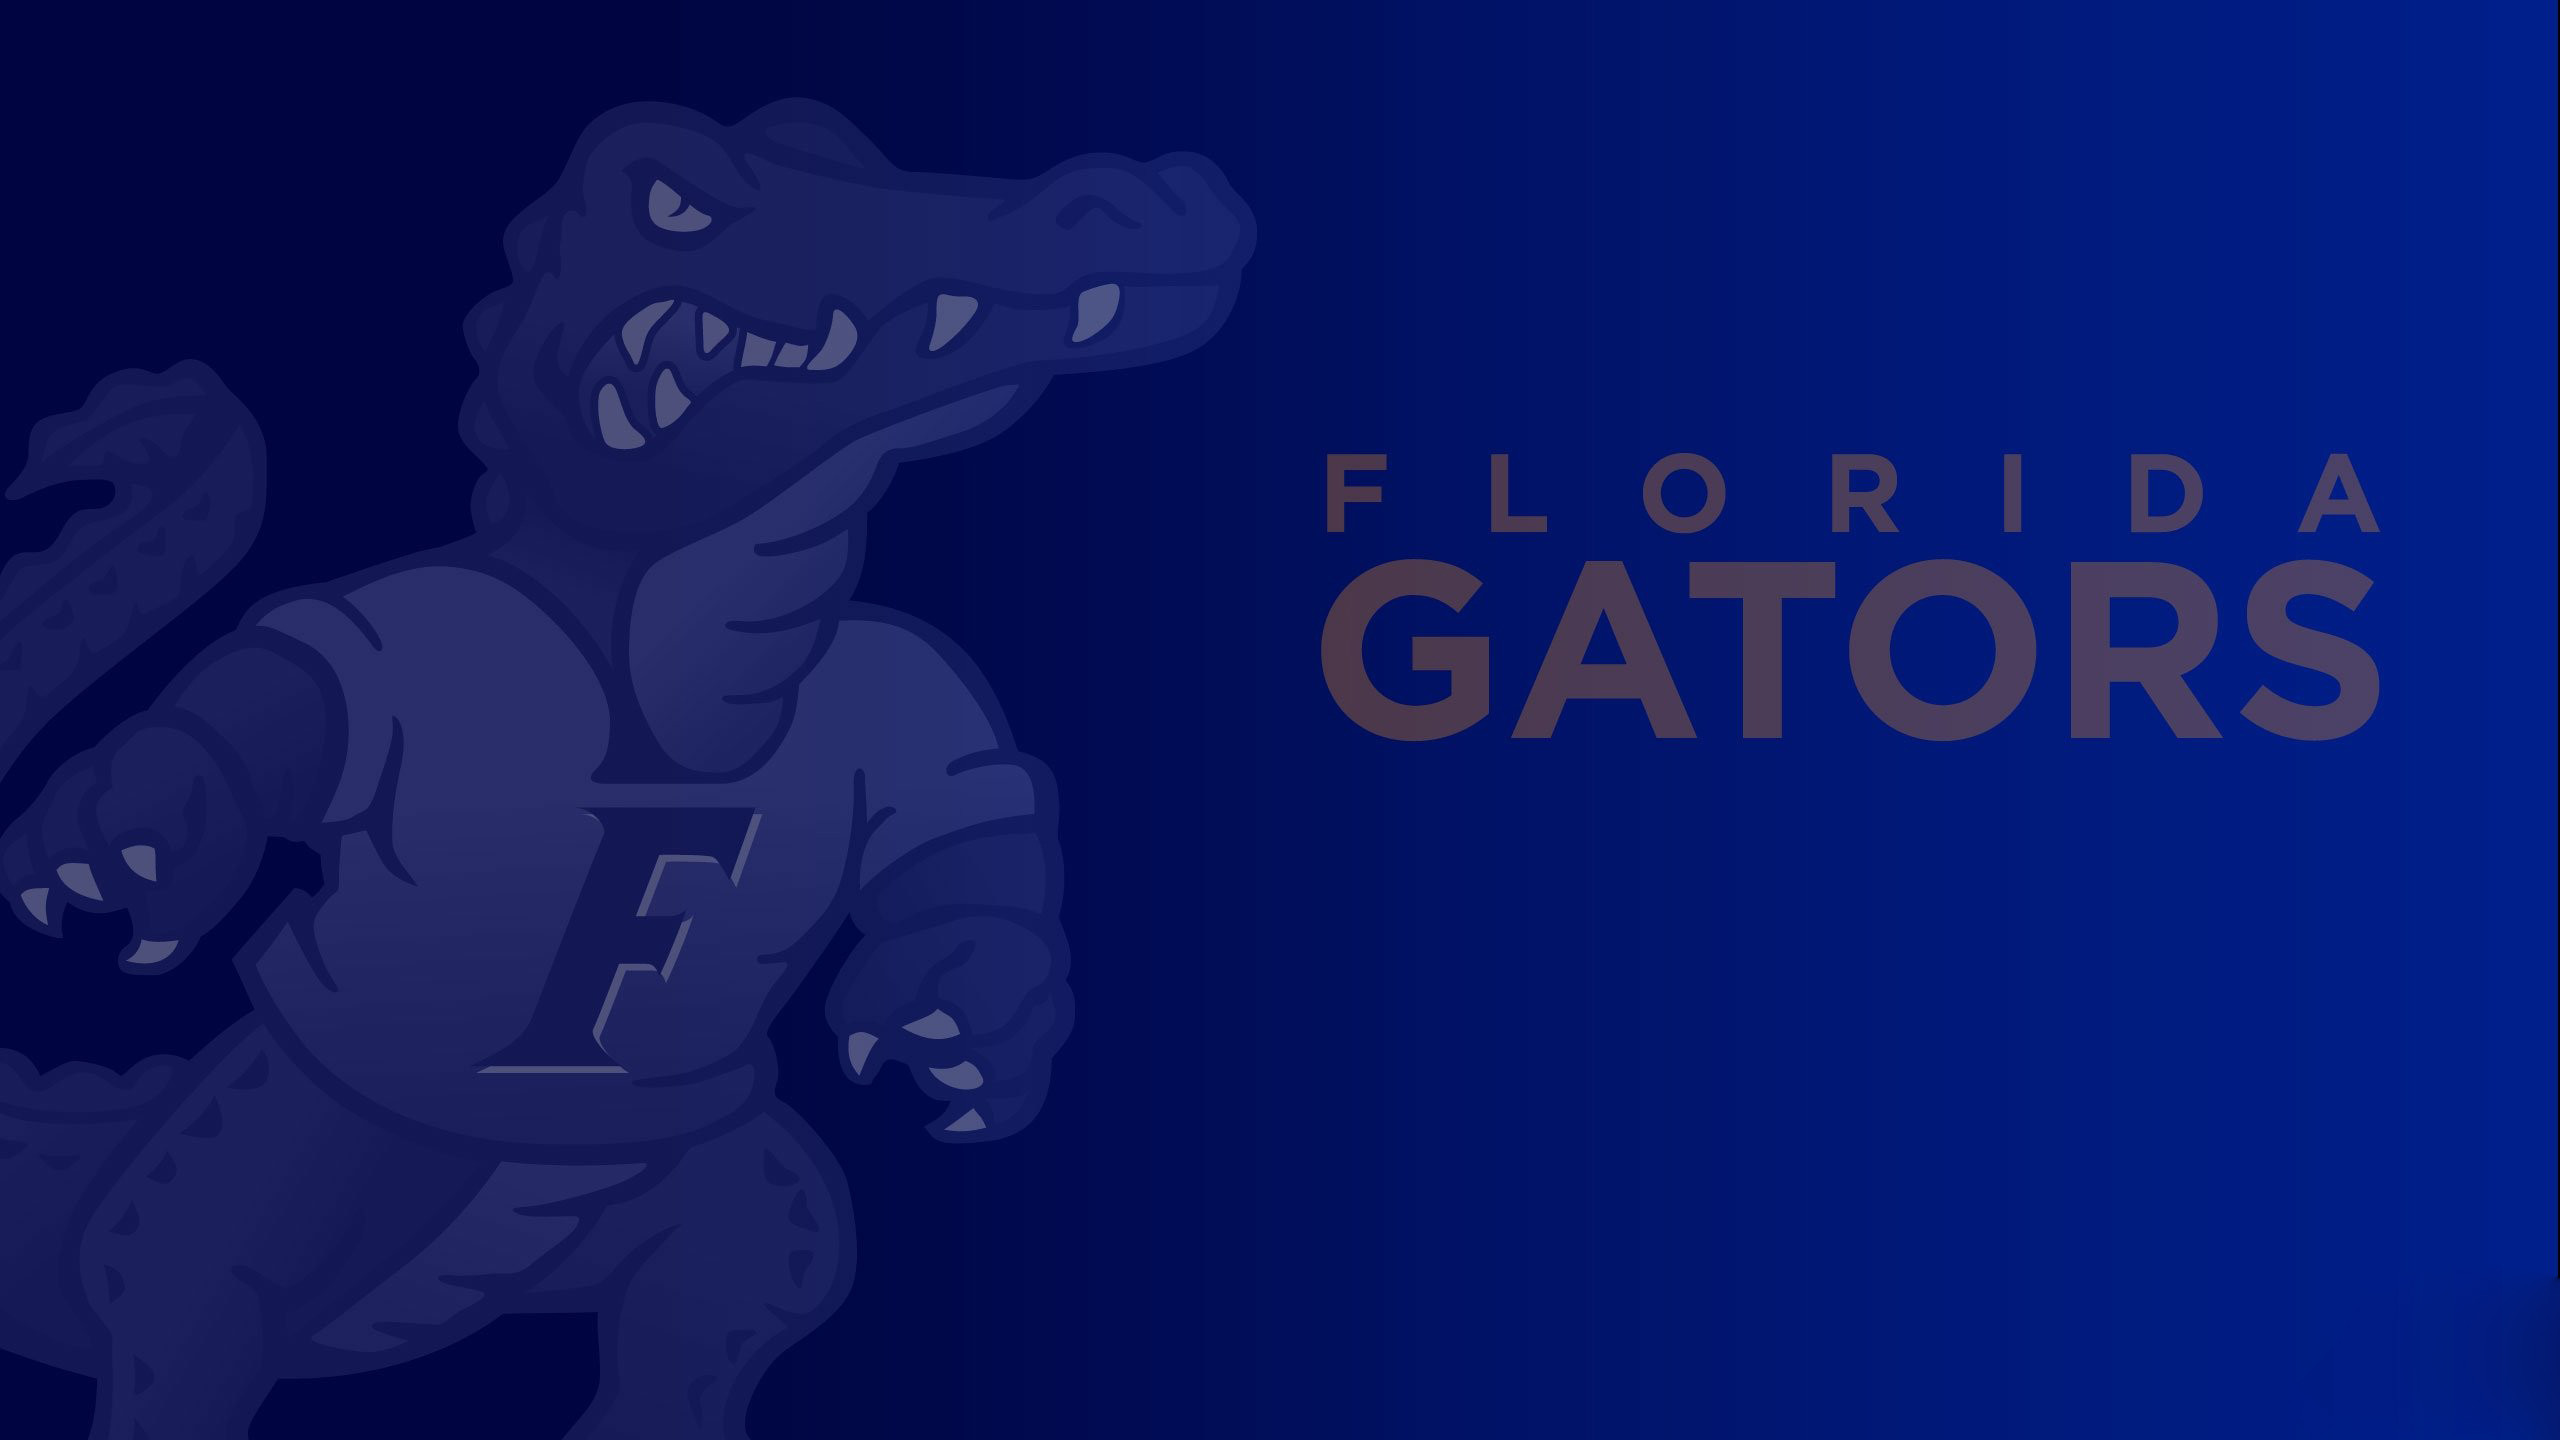 wallpaper.wiki-Wallpaper-dark-blue-sports-gators-desktop-